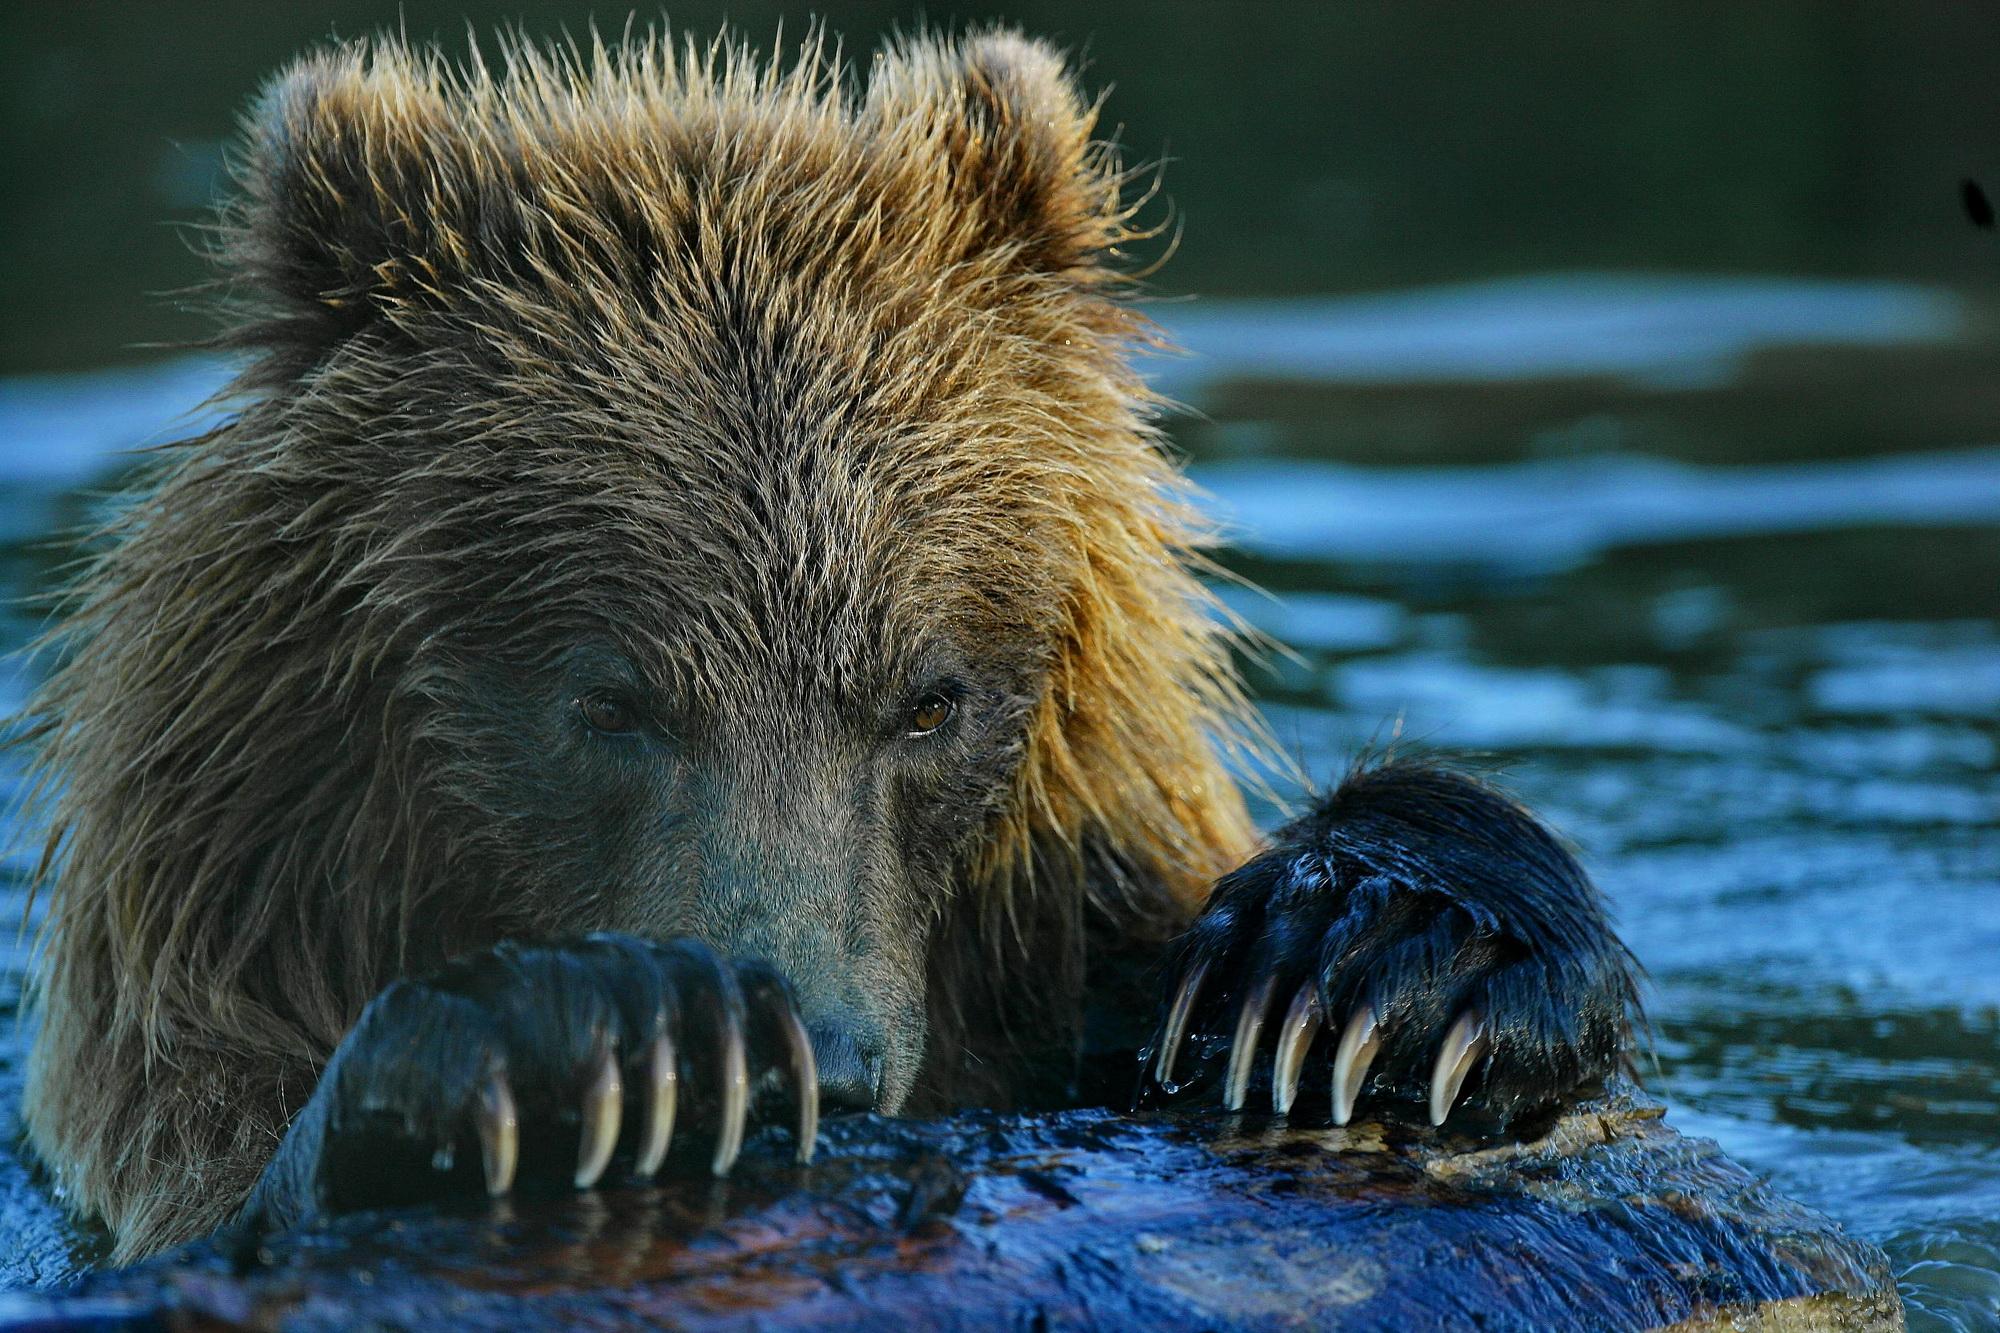 Alaska_VG3X6708_∏ Luca Bracali